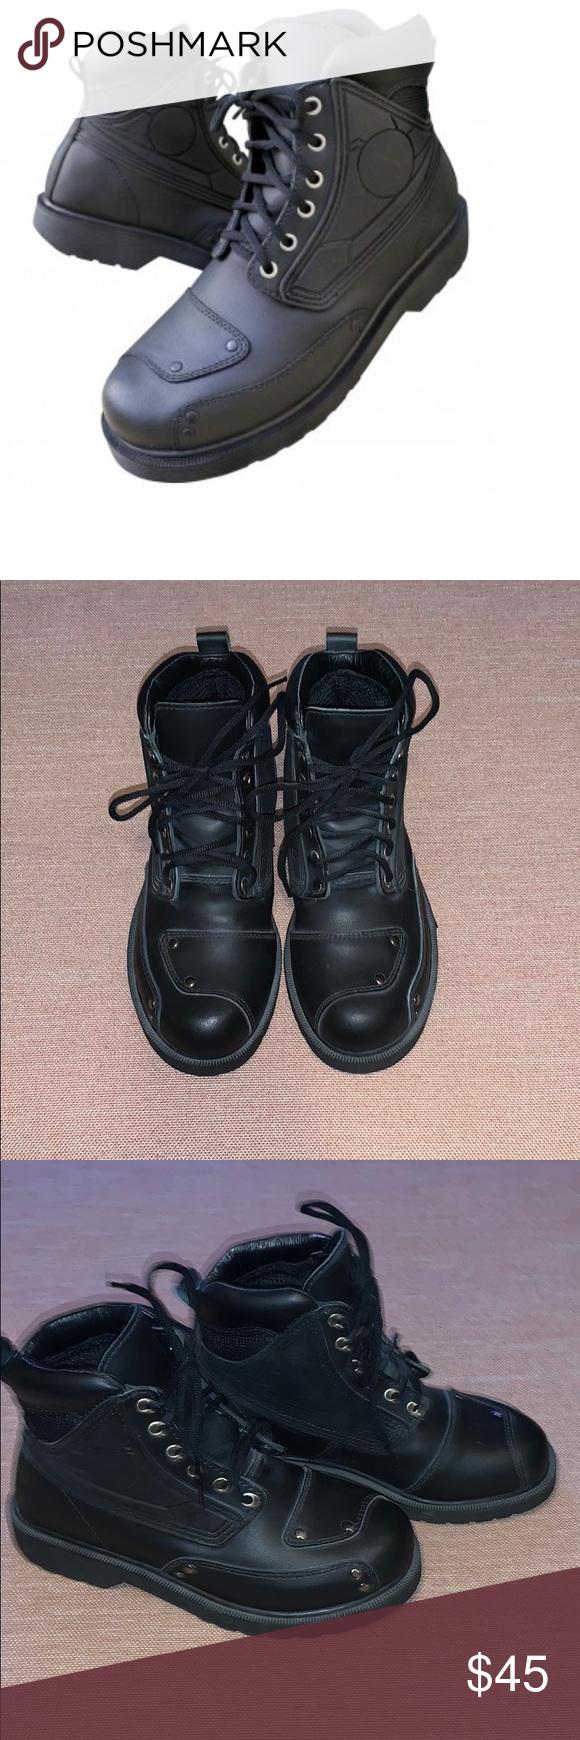 36f266df25a Joe Rocket black leather Moto boots EUC sz 6 Joe Rocket Womens Orbit ...